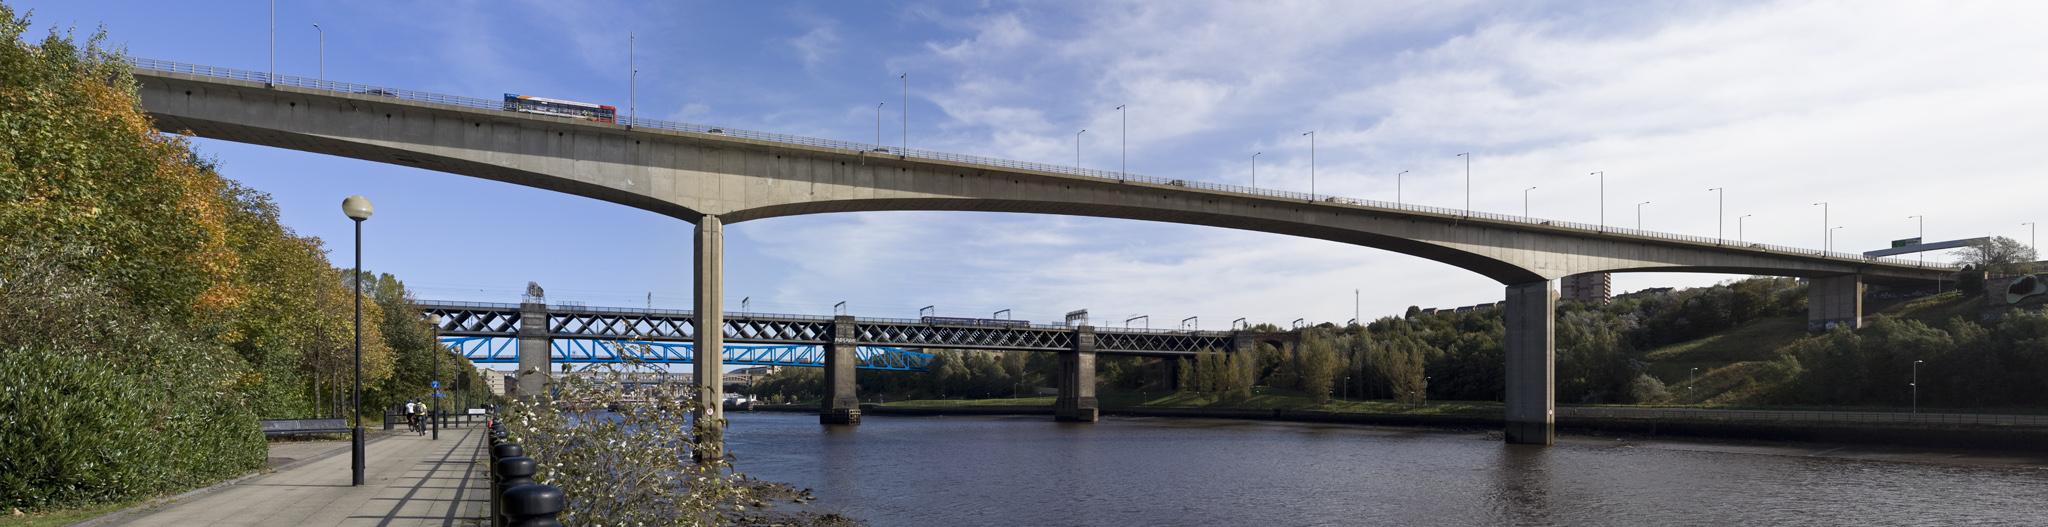 Photographs of Tyne Bridges, Newcastle by Peter Loud